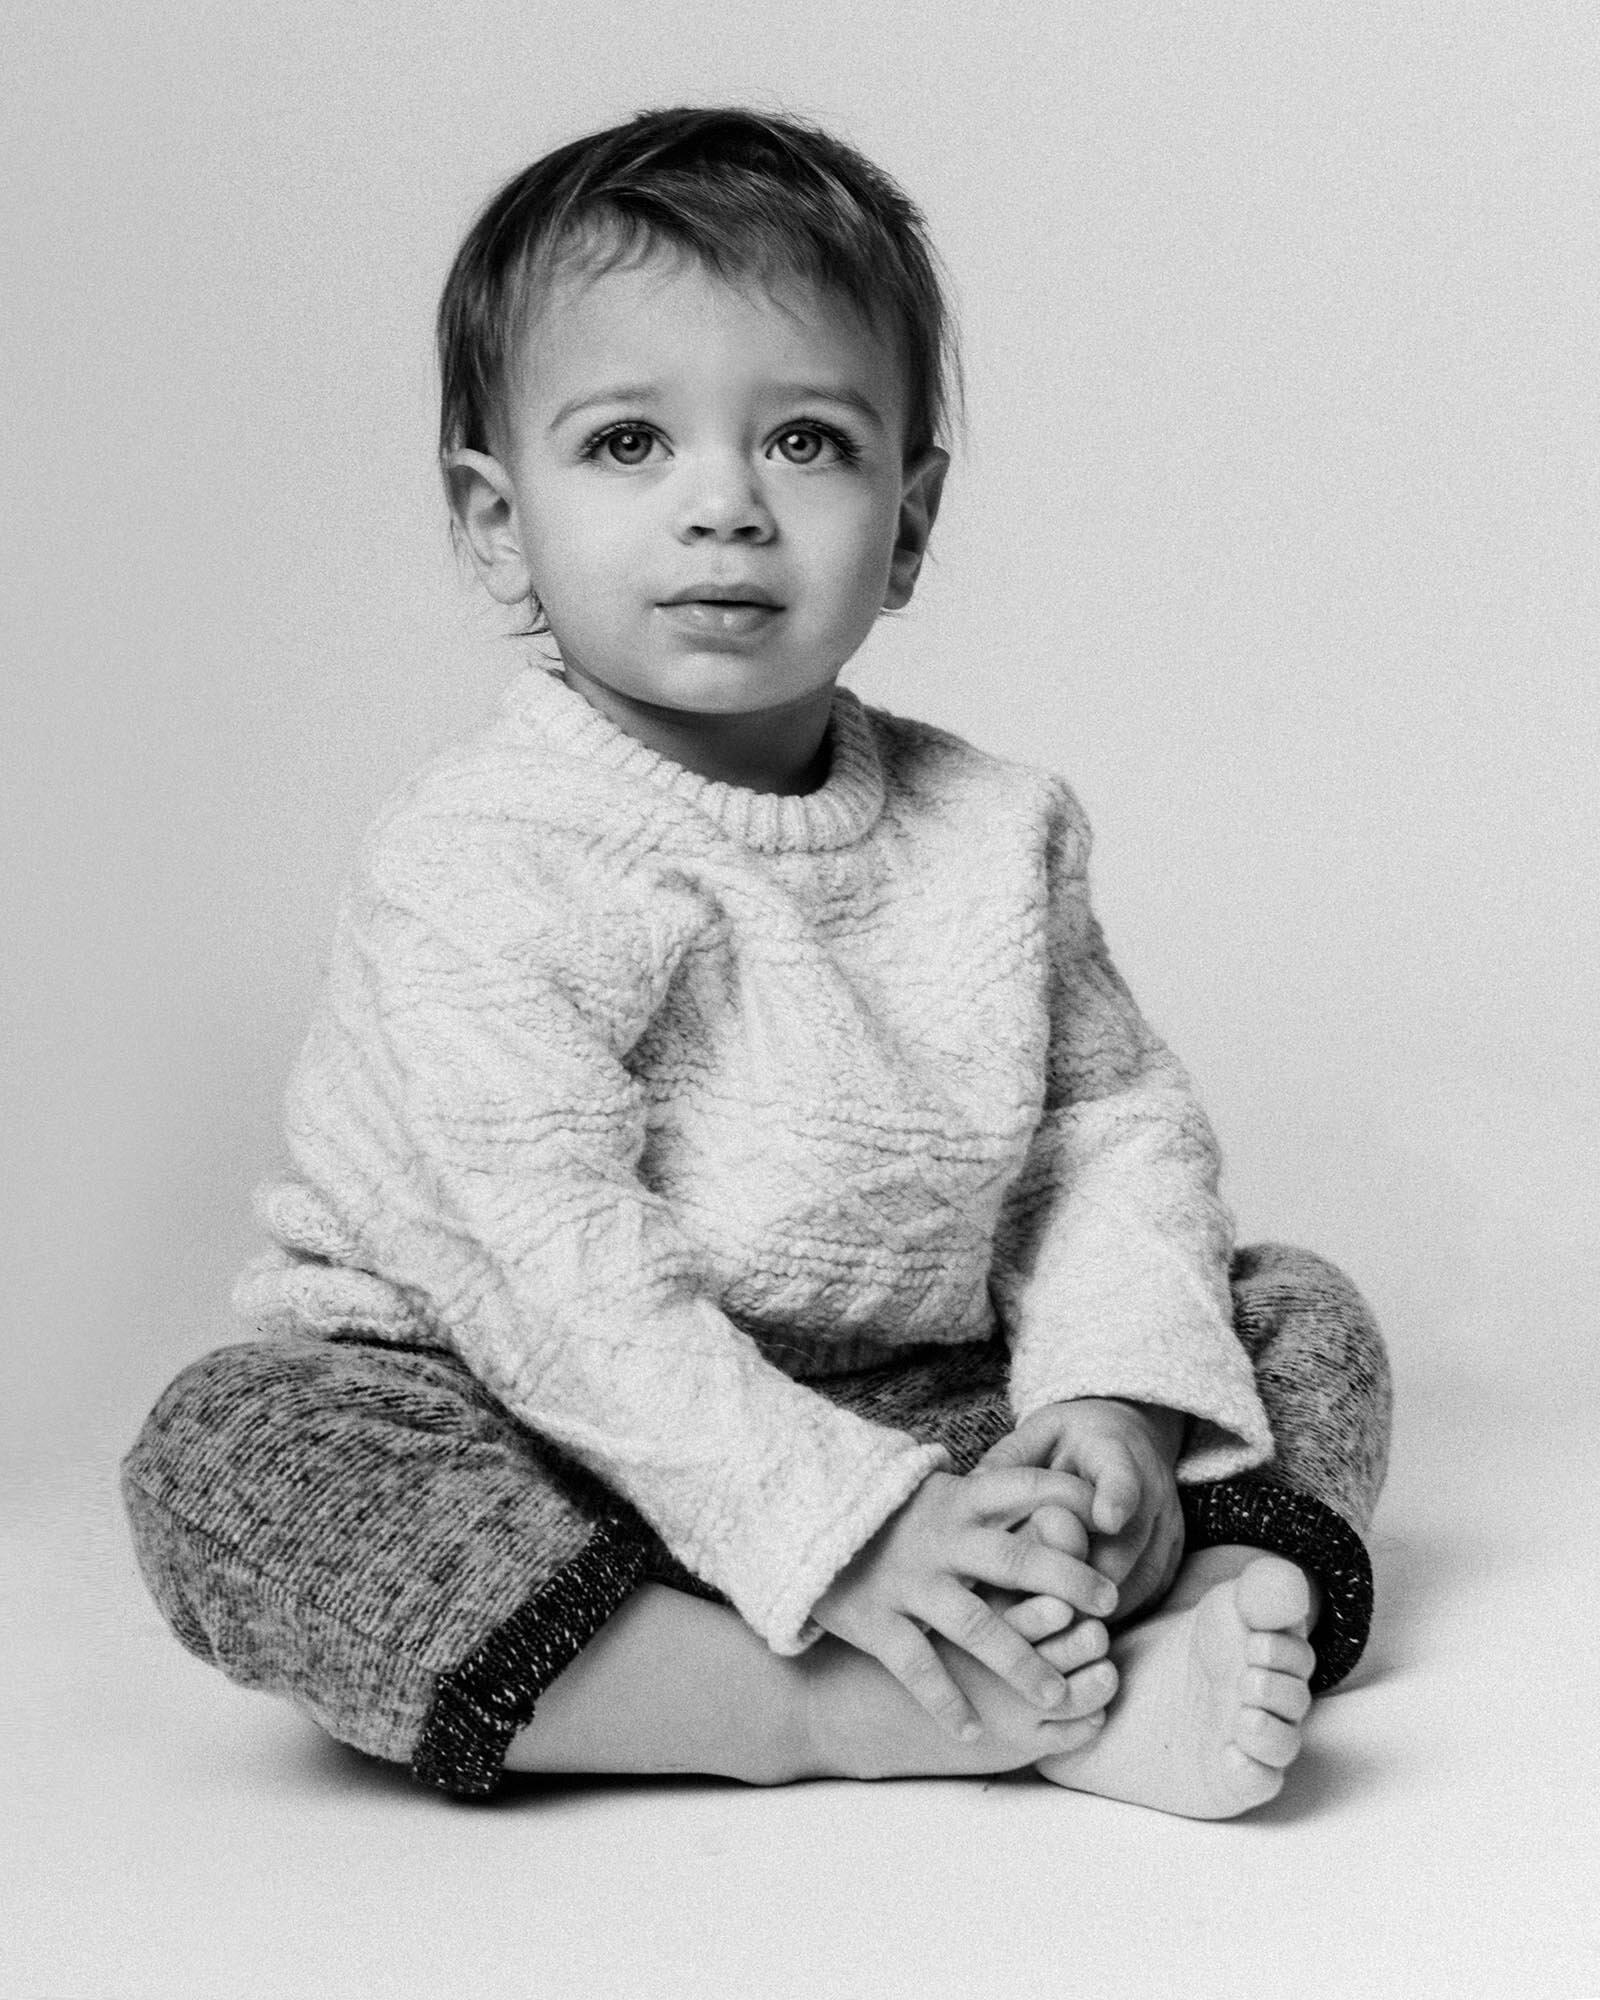 nyc-photographers-baby-modeling-nyc-10002.jpg